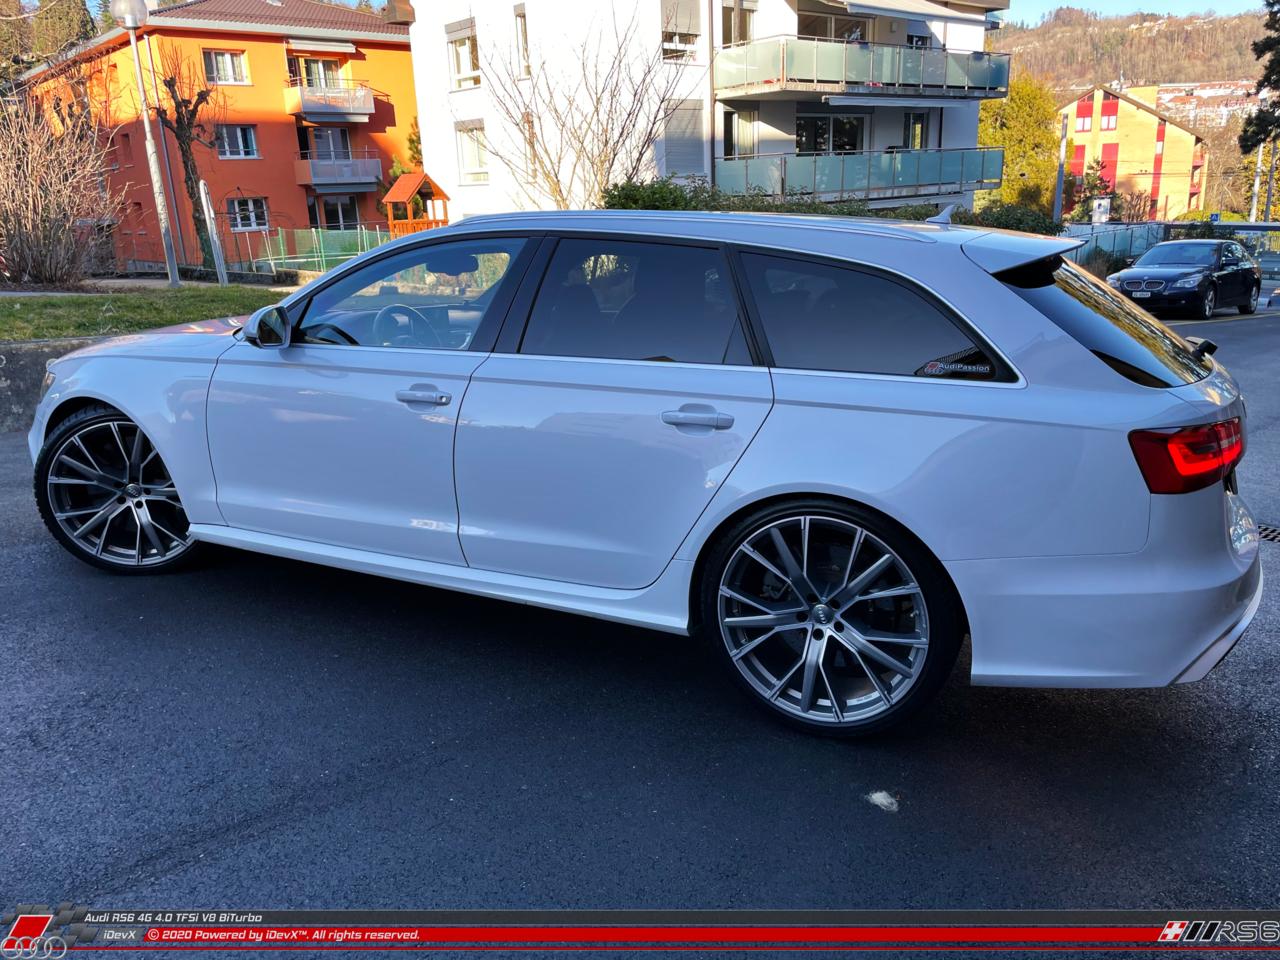 21.02.2021_Audi-RS6_iDevX_004.png